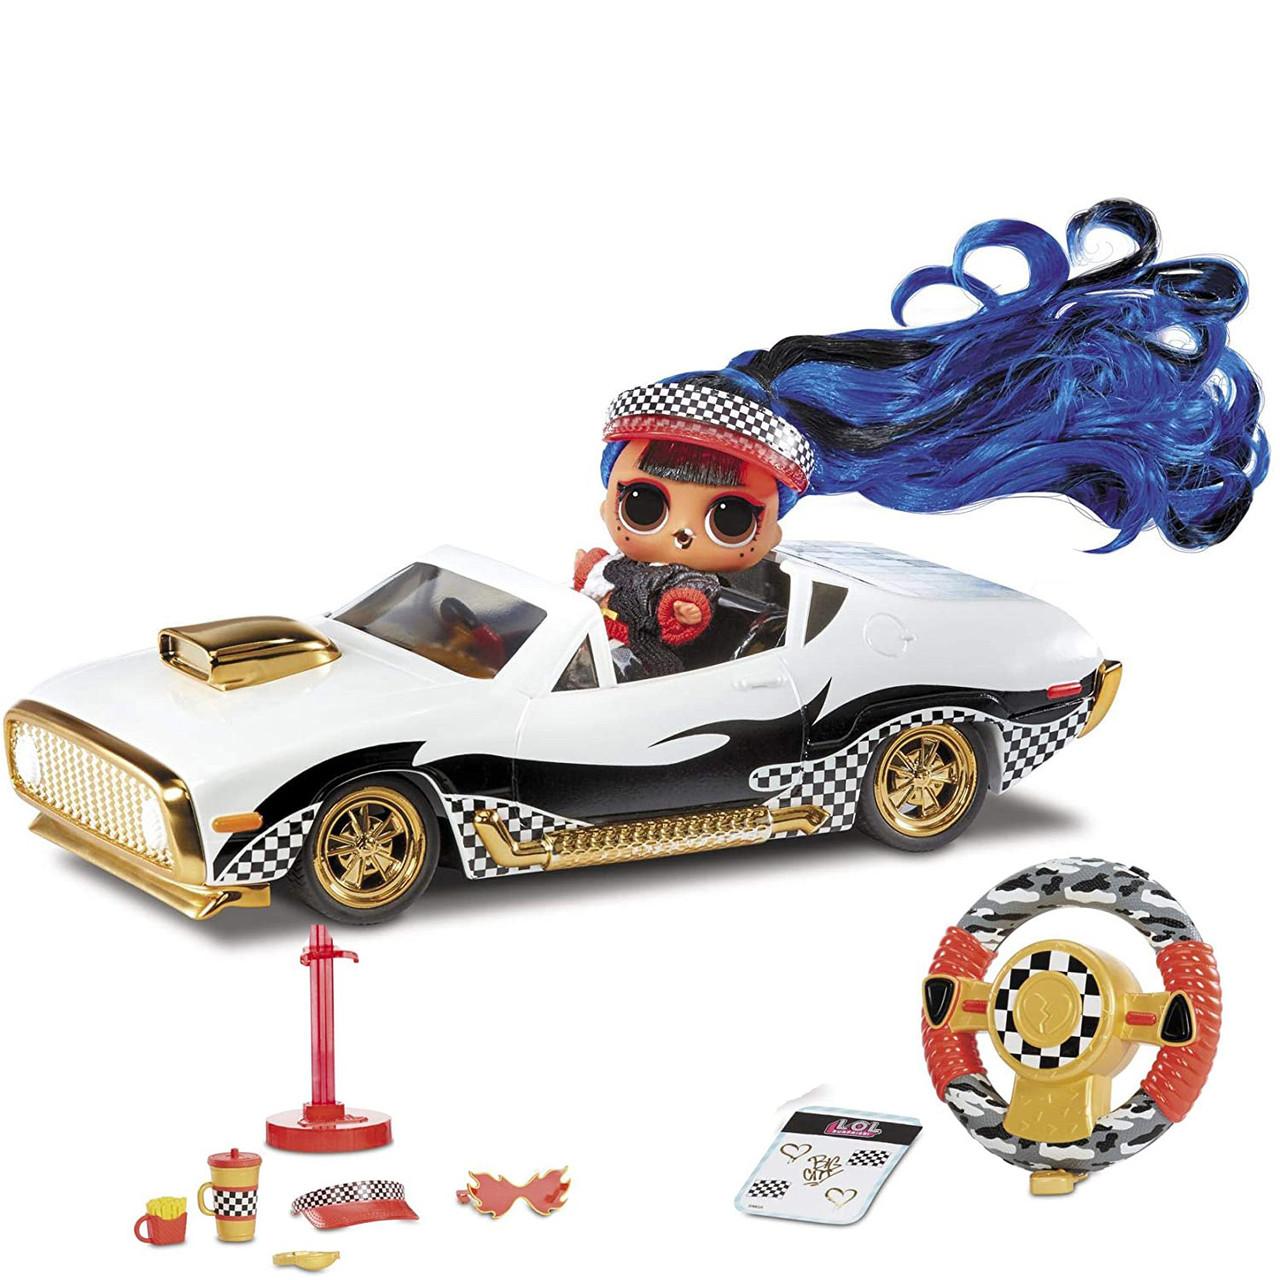 Кукла ЛОЛ Машина на радиоуправлении кабриолет L.O.L. Surprise! RC Wheels Remote Control Car